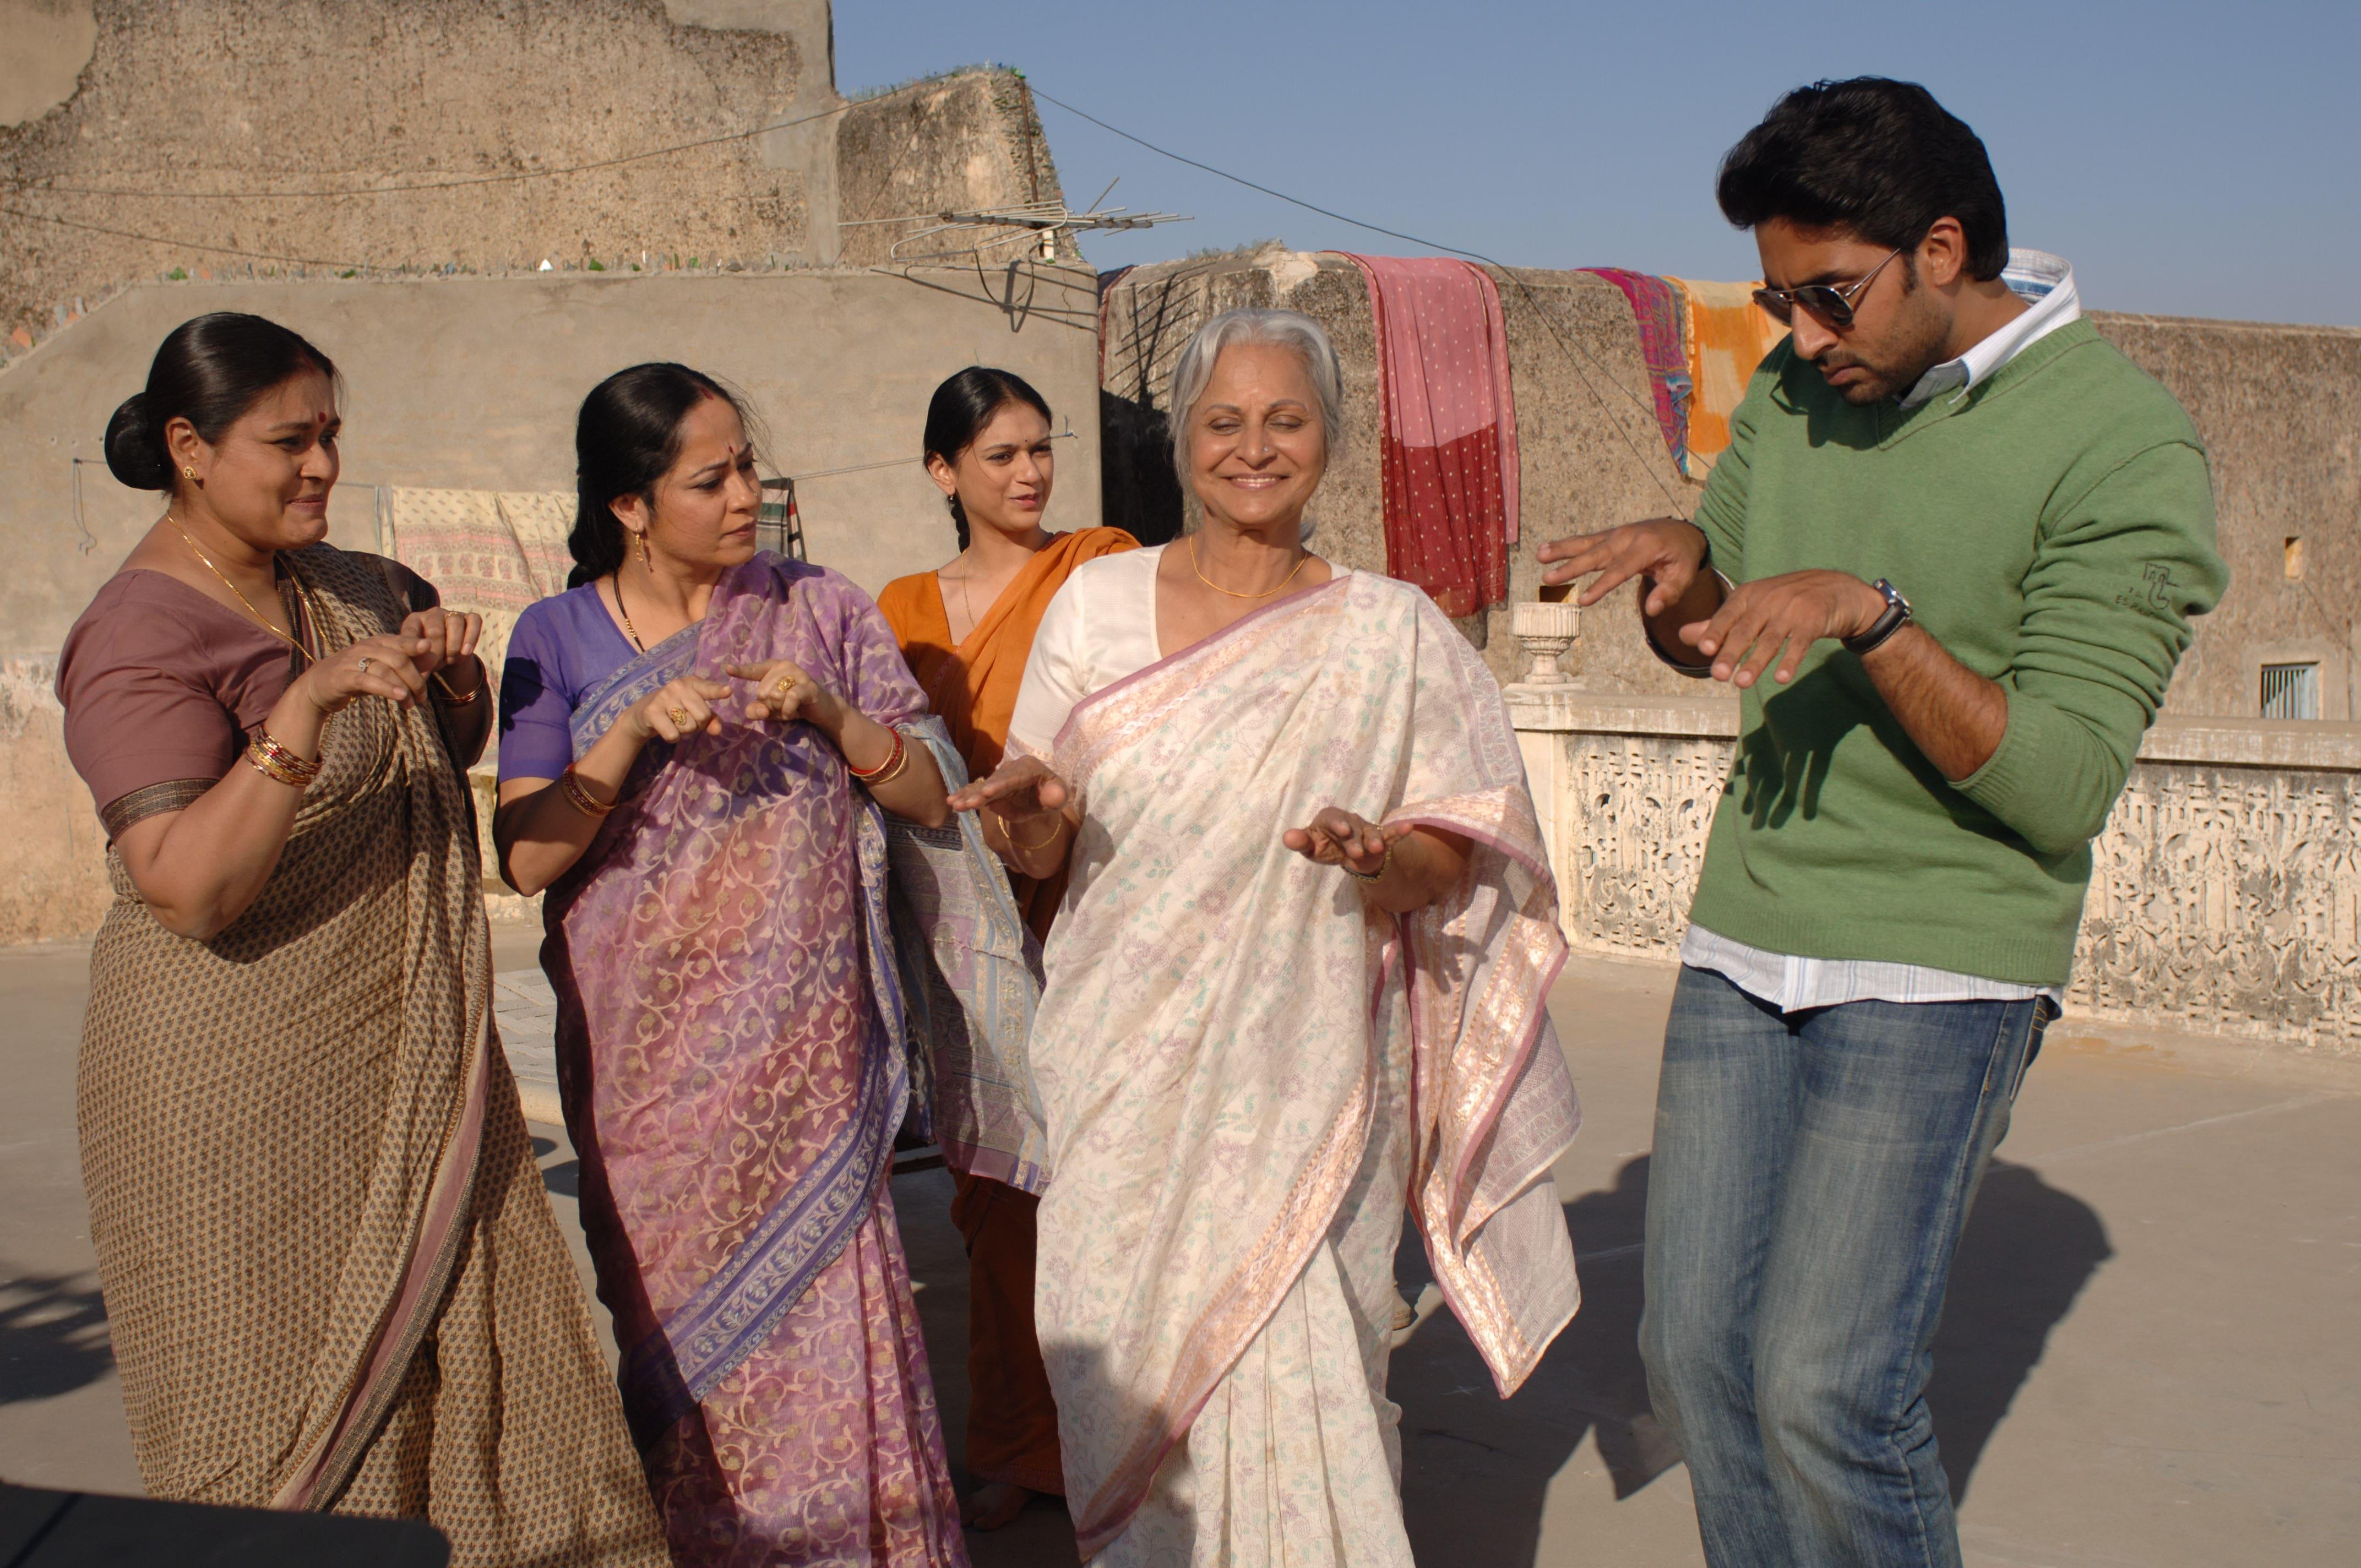 अभिषेक बच्चन नहीं बल्कि ये एक्टर्स निभाने वाले थे फिल्म दिल्ली-6 में लीड किरदार !